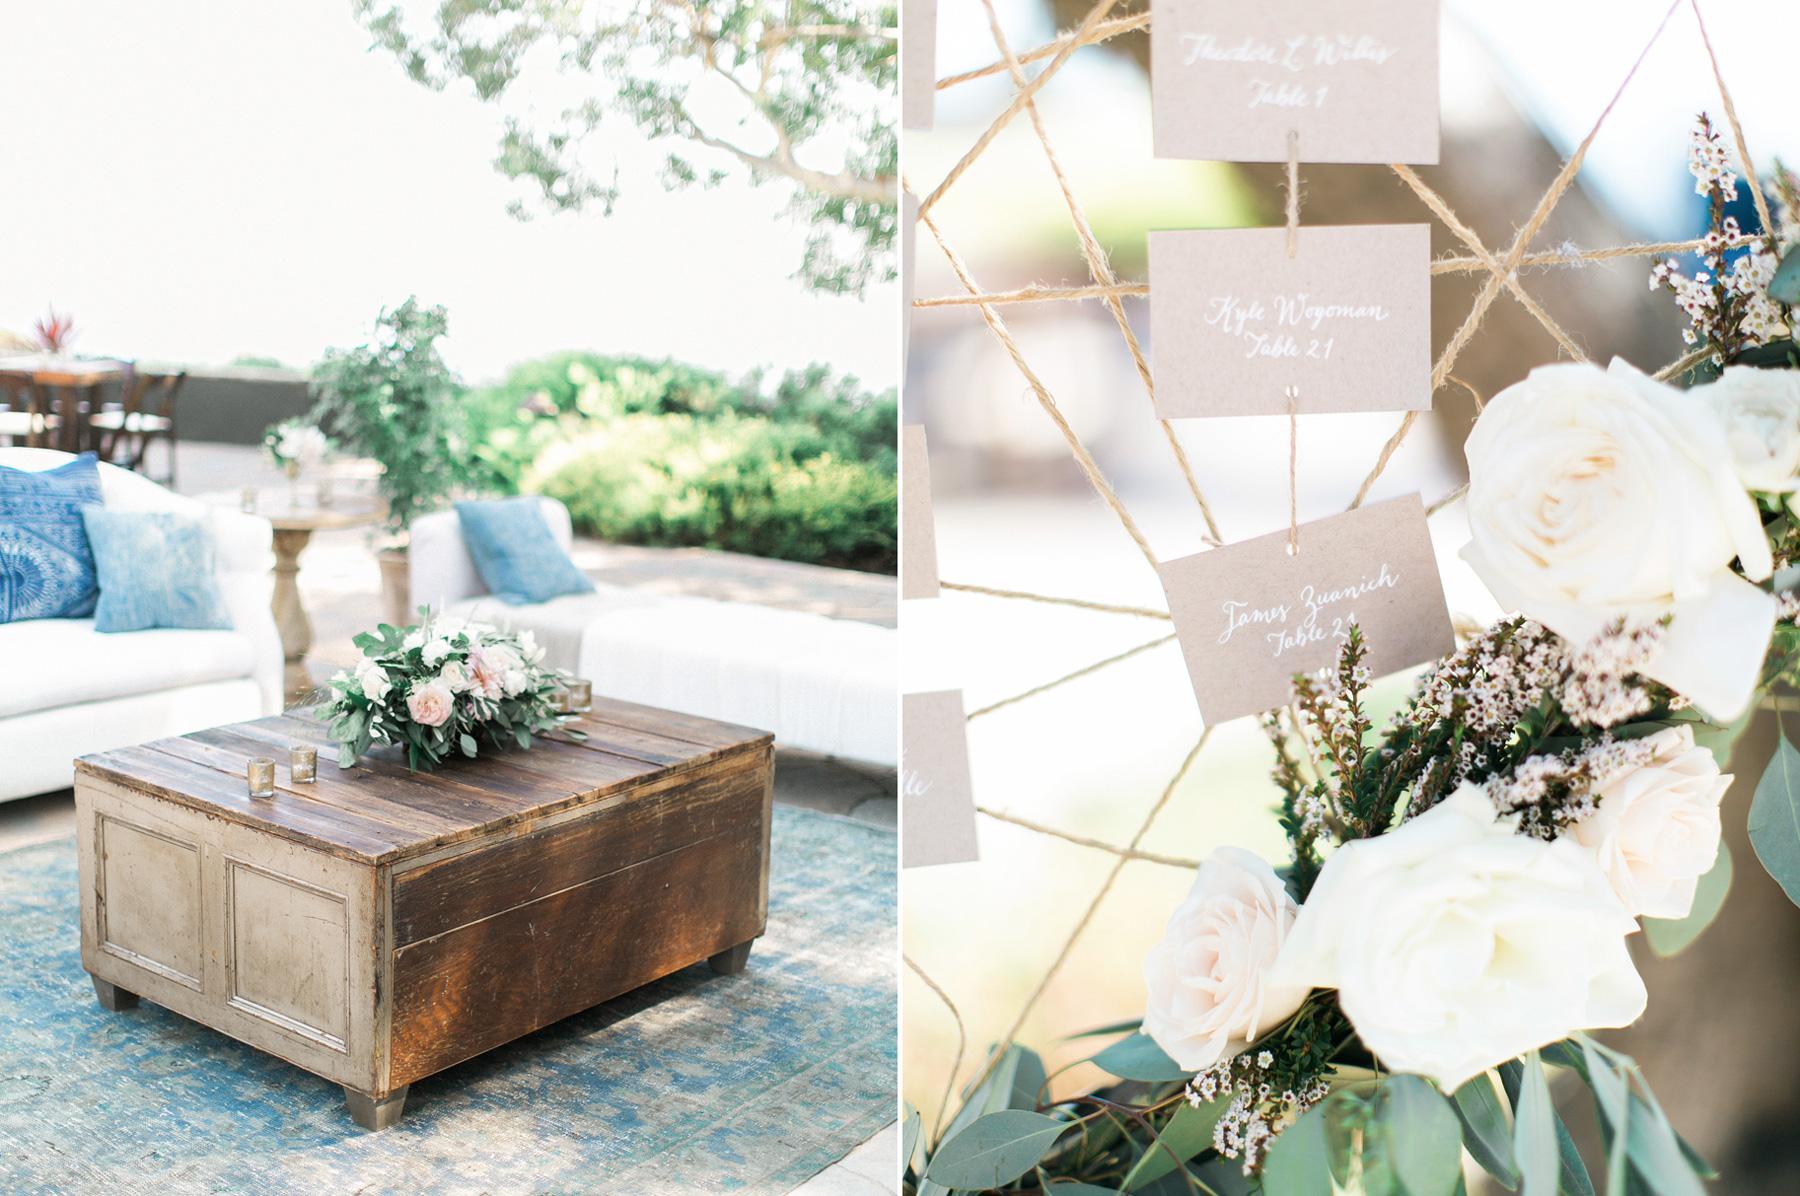 Catalina-View-Gardens-Wedding-29